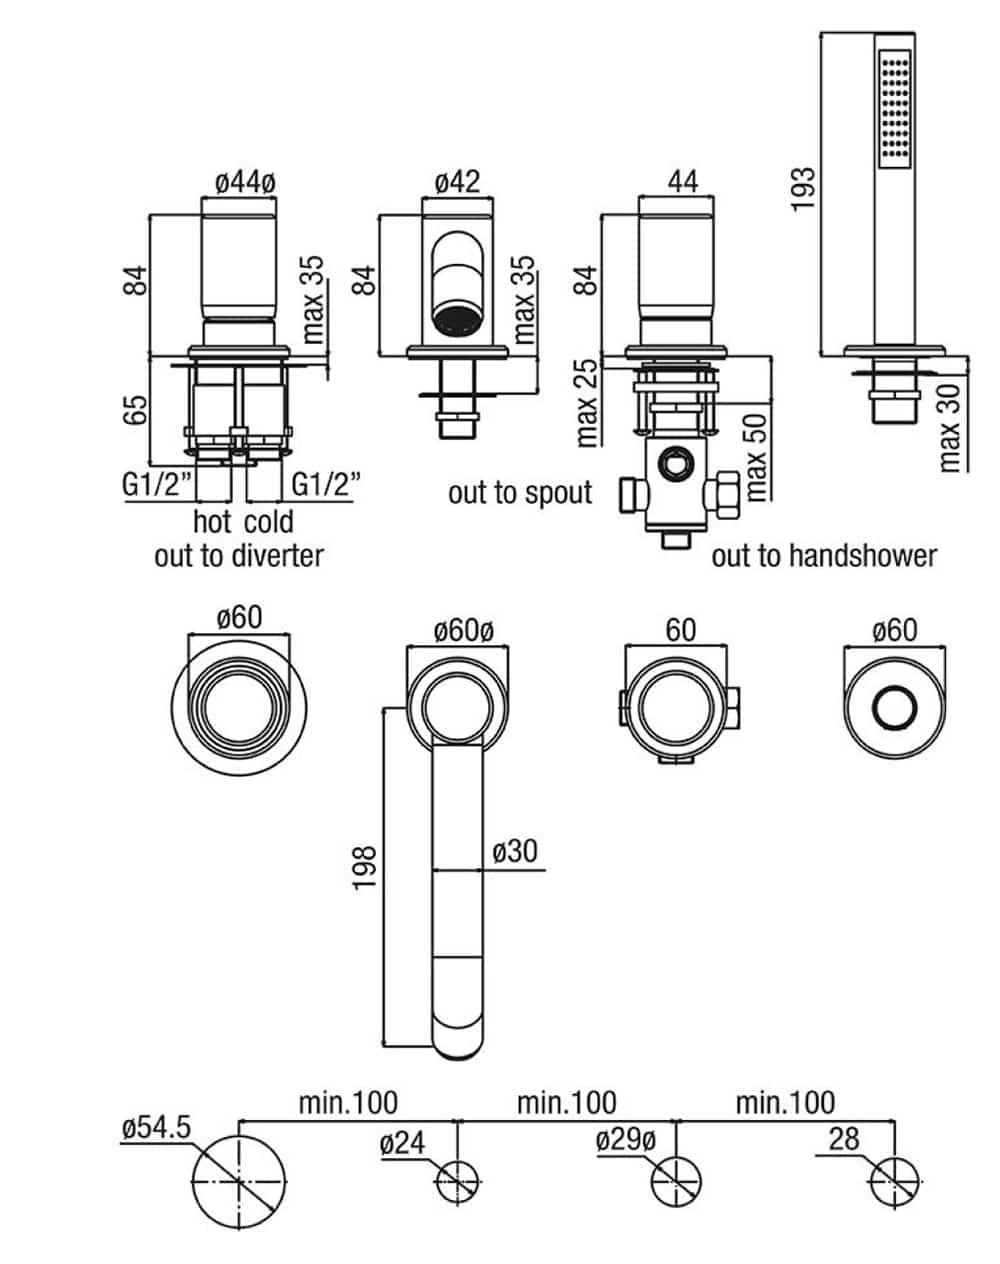 alpi-portofino-bathroom-POM27D31362-tex-info-01